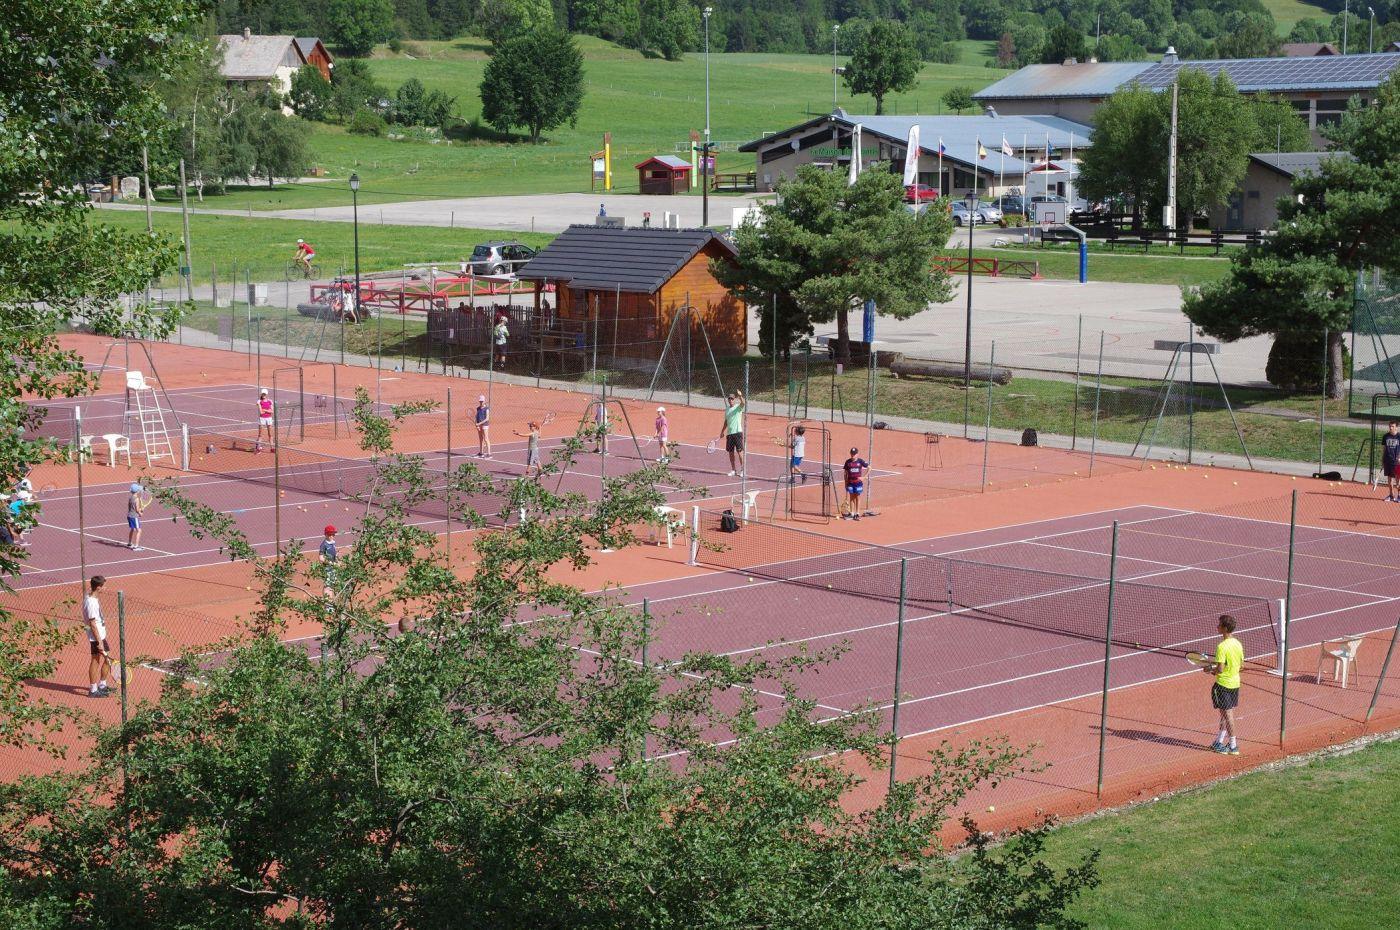 Terrains tennis Autrans